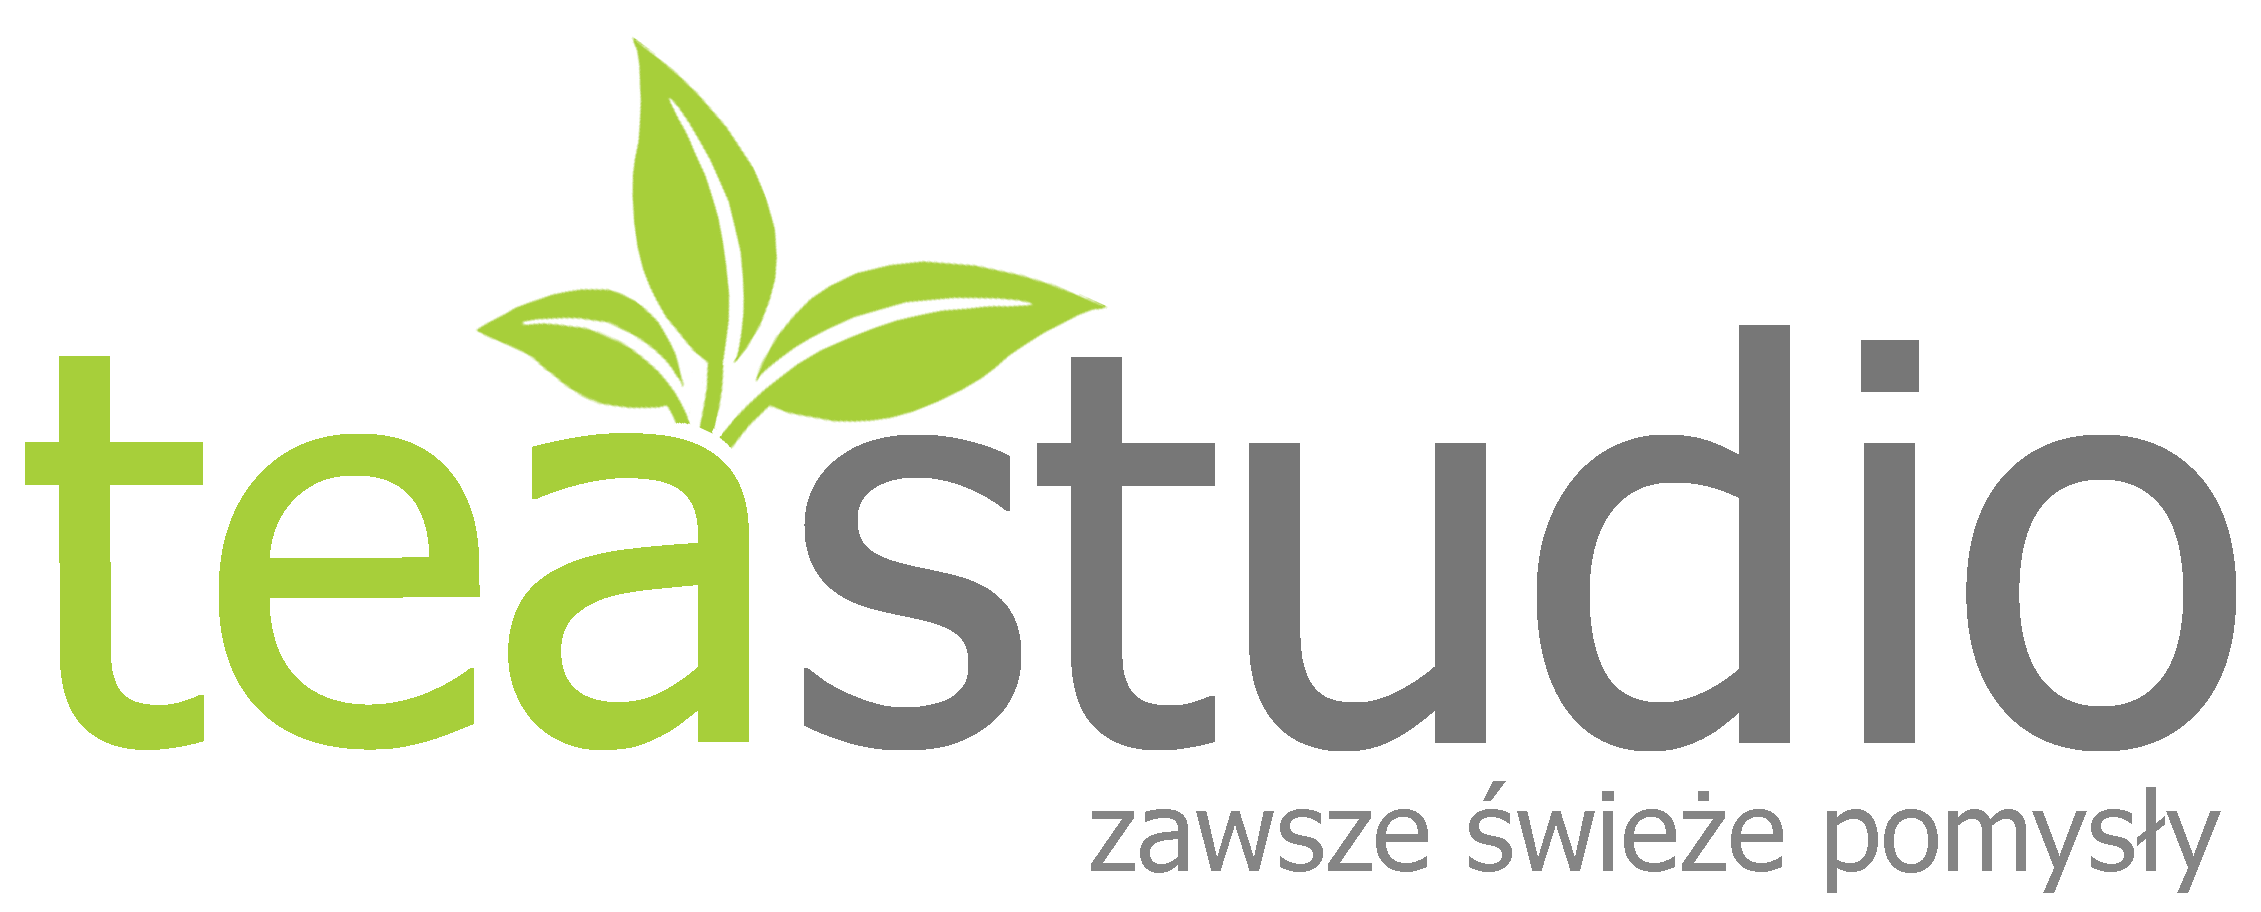 teastudio.pl - logo